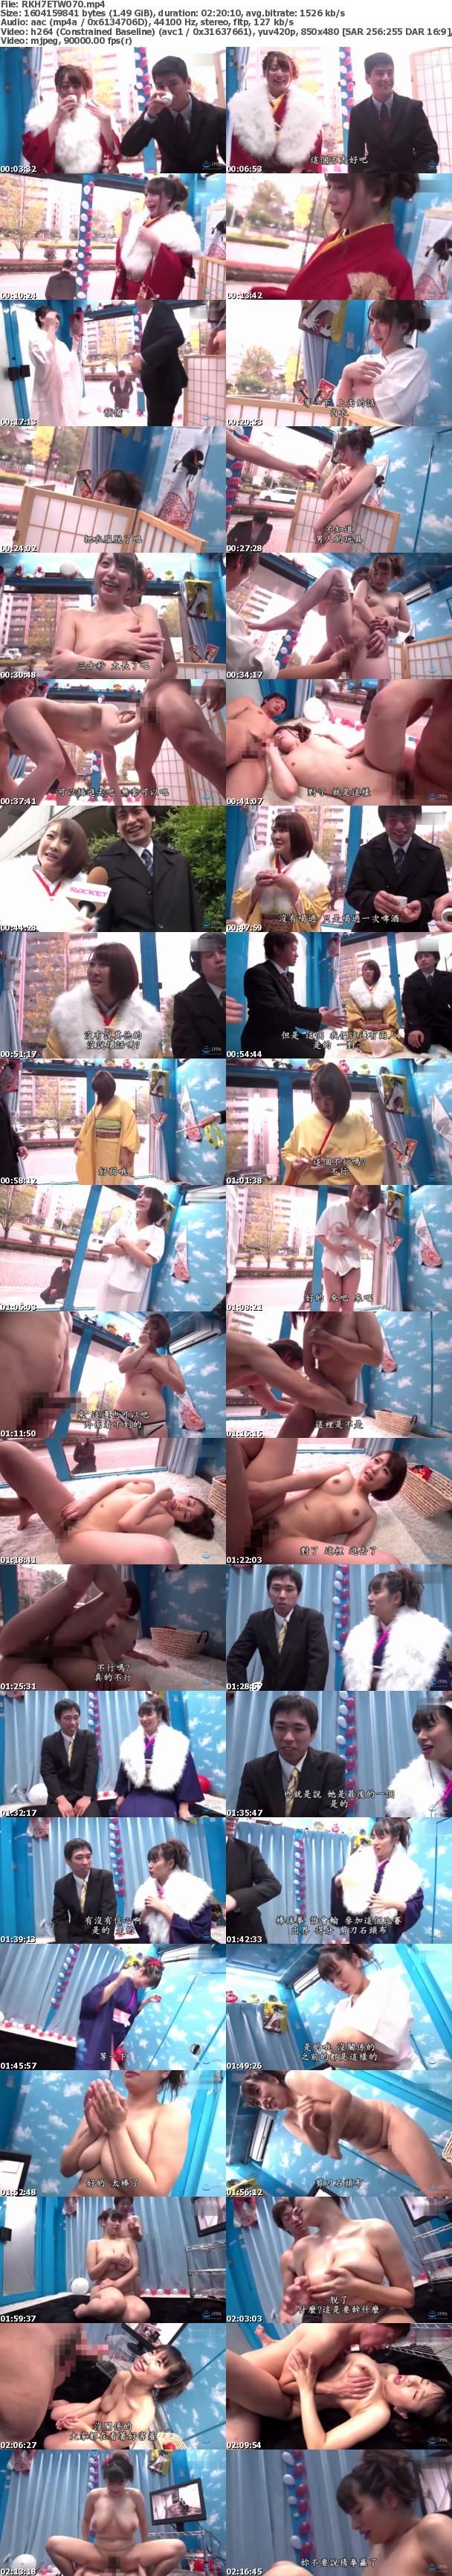 RCTD-070 嘻哈鏡一號 祝!成人禮 20歲的可愛巨乳美少女限定 在男朋友面前劃拳脫衣[中文字幕]